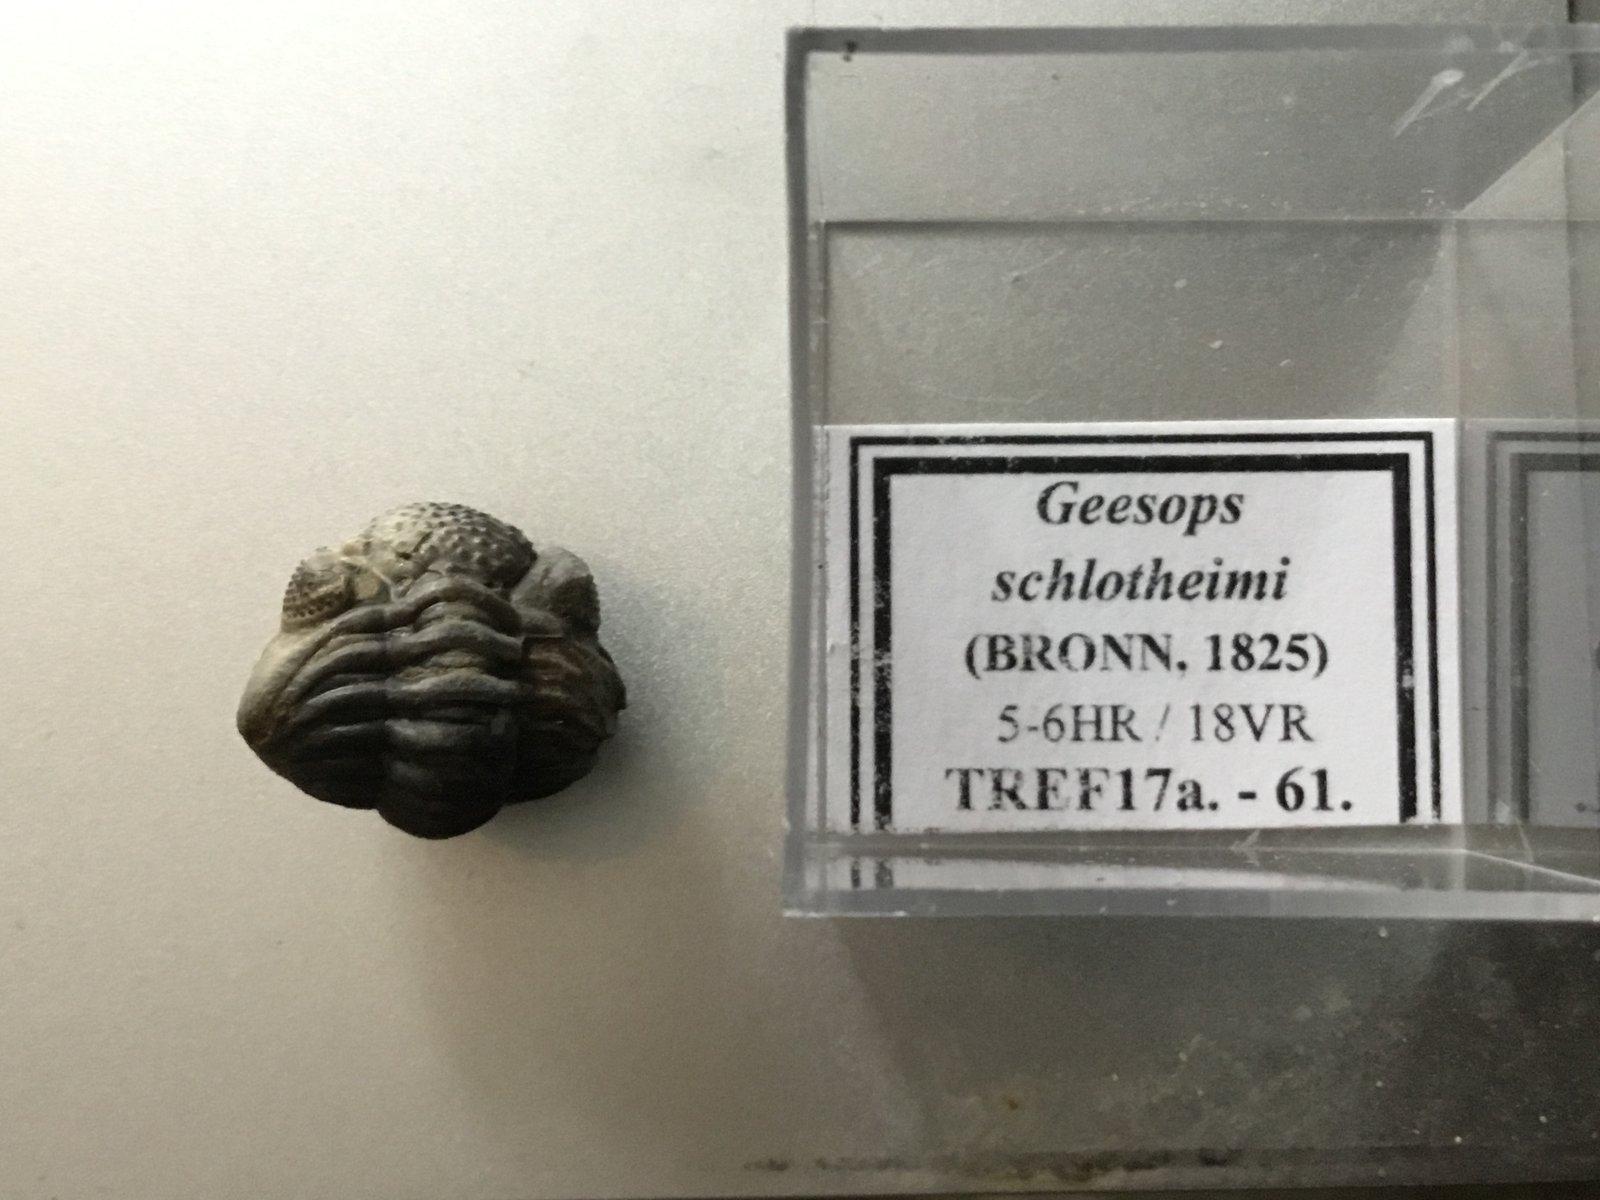 Geesops schlotheimi